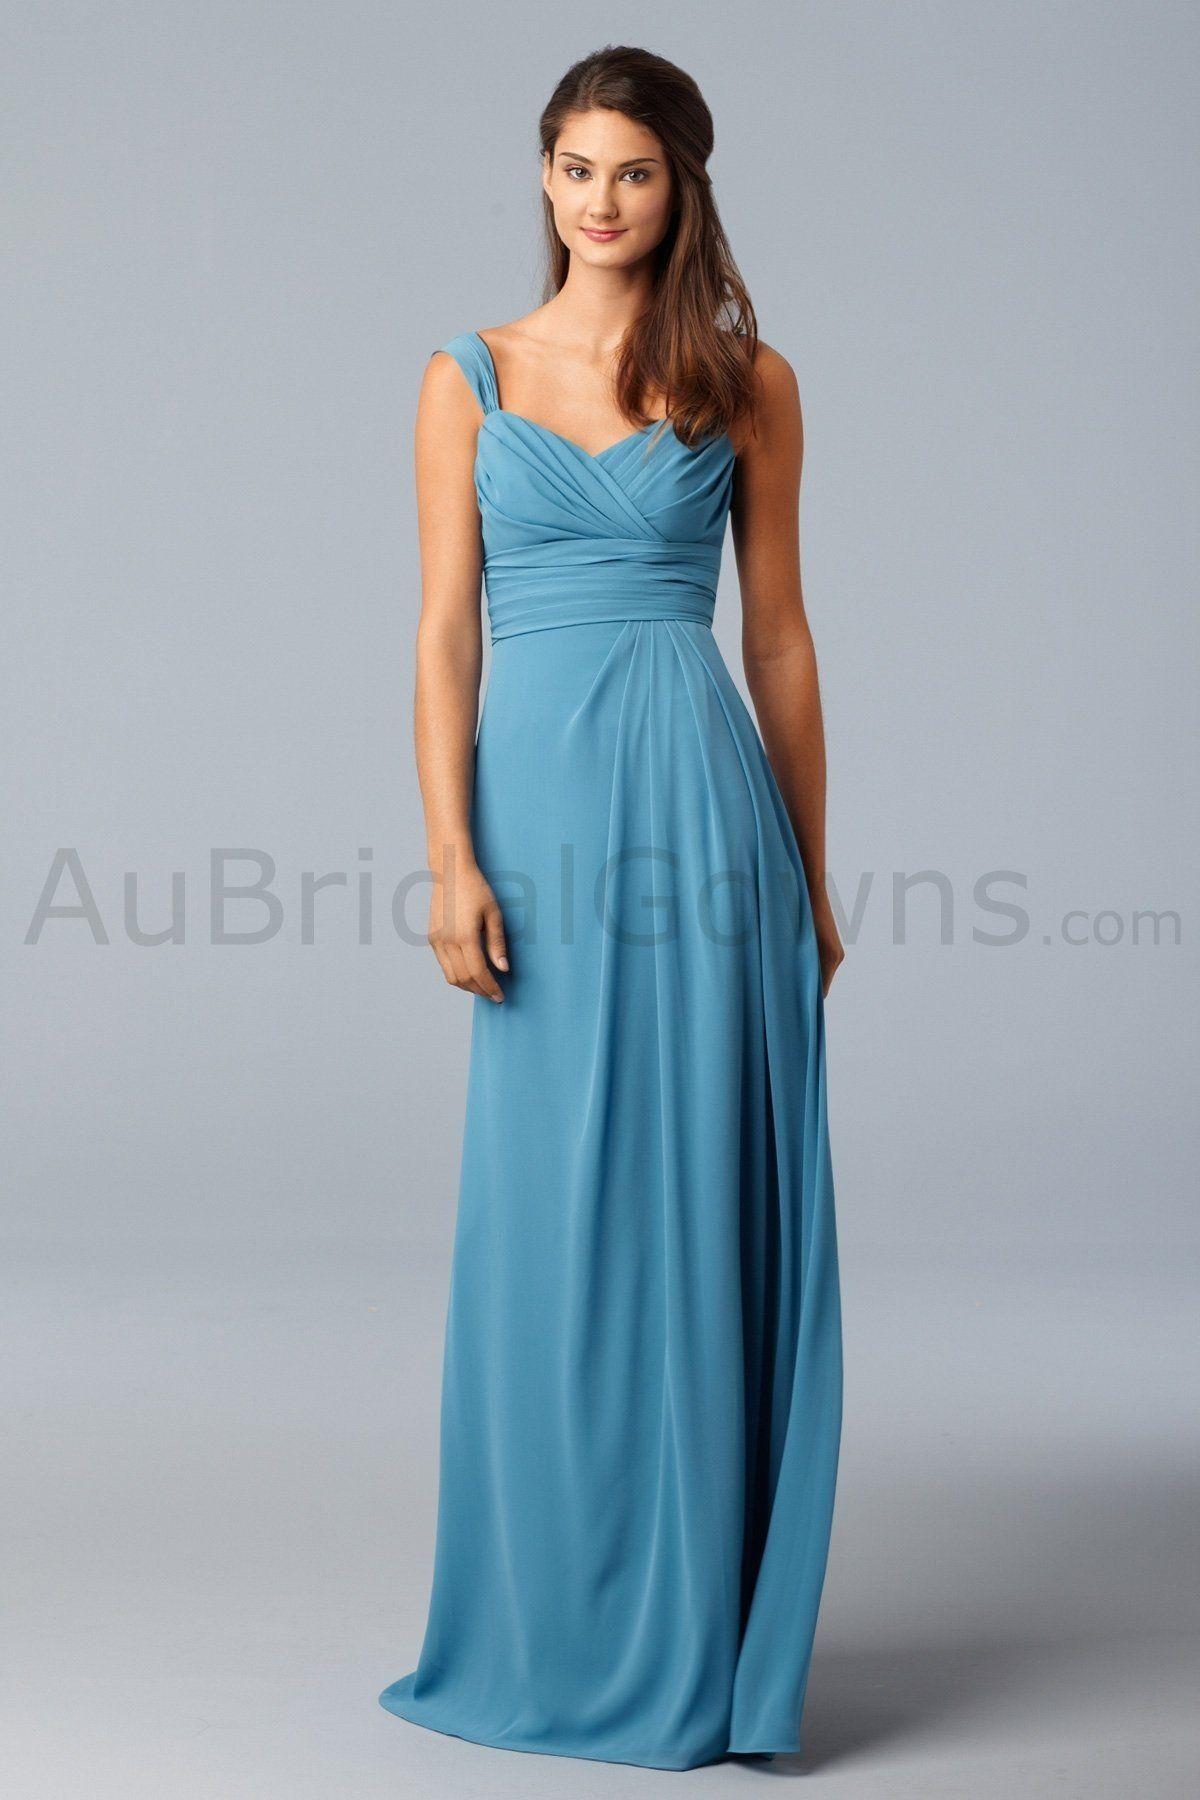 Chiffon Surplice Neck Cap Sleeves Floor-Length Bridesmaid Dress ...